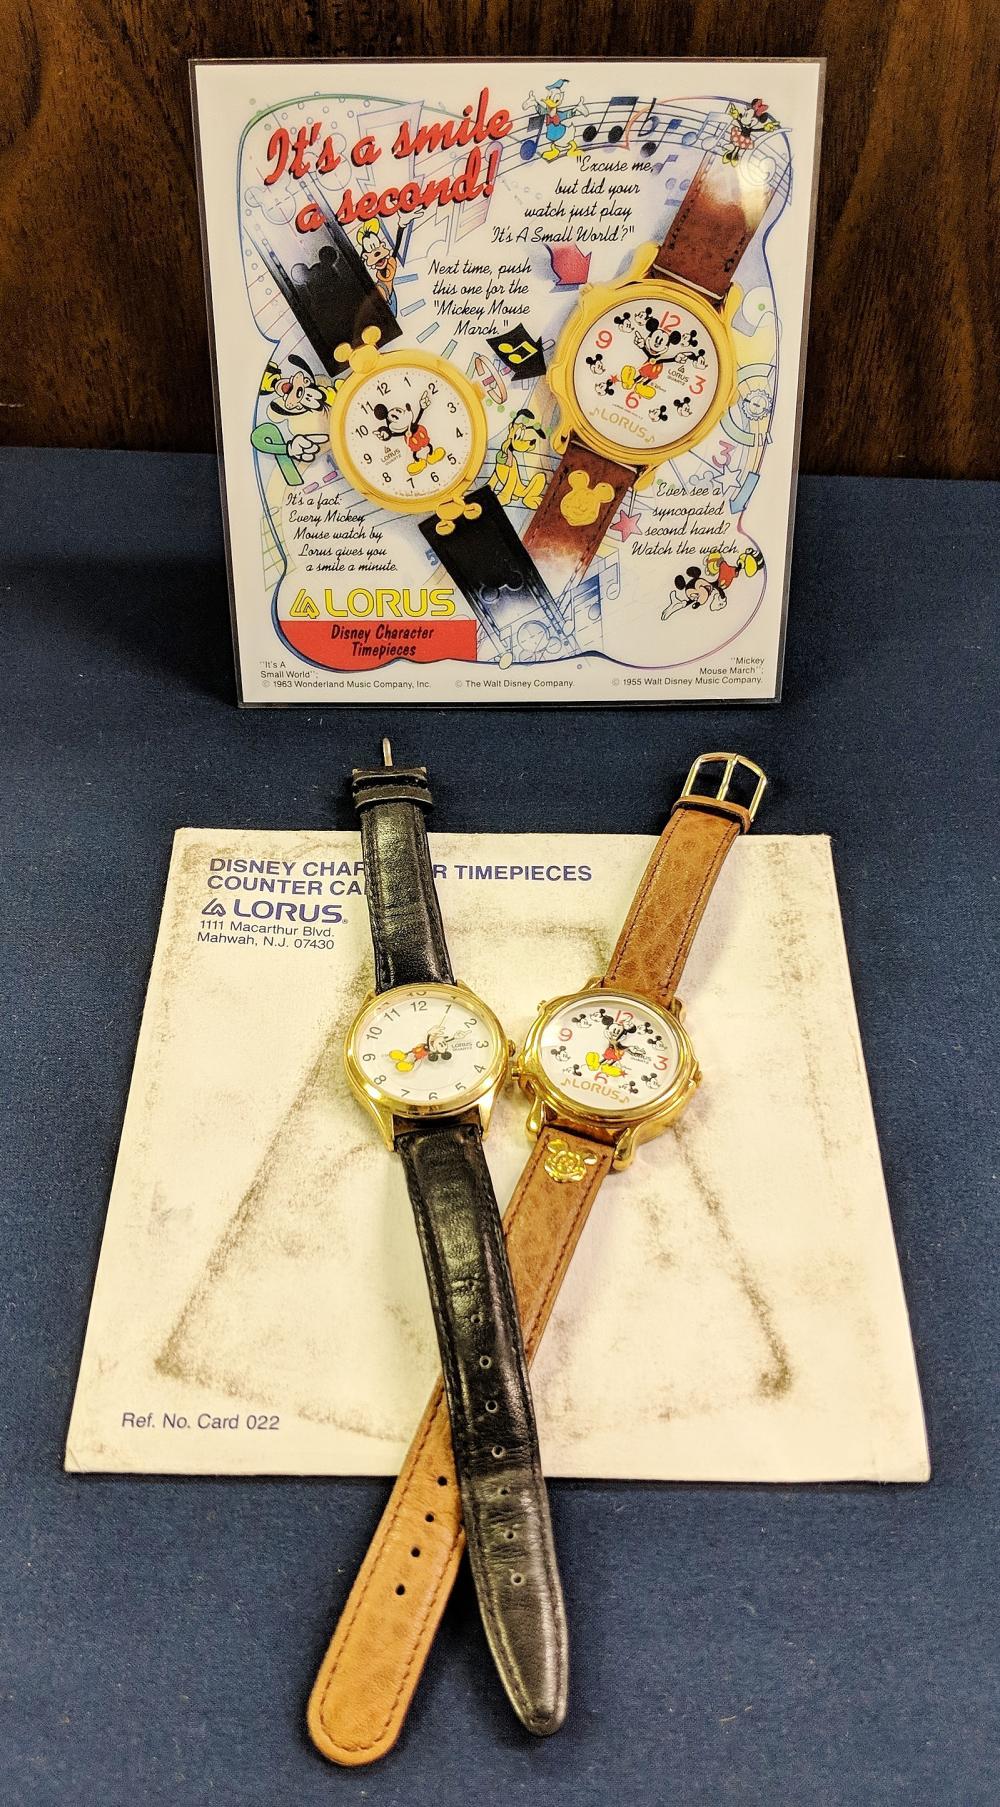 2 Lorus Disney Watches w/ Display